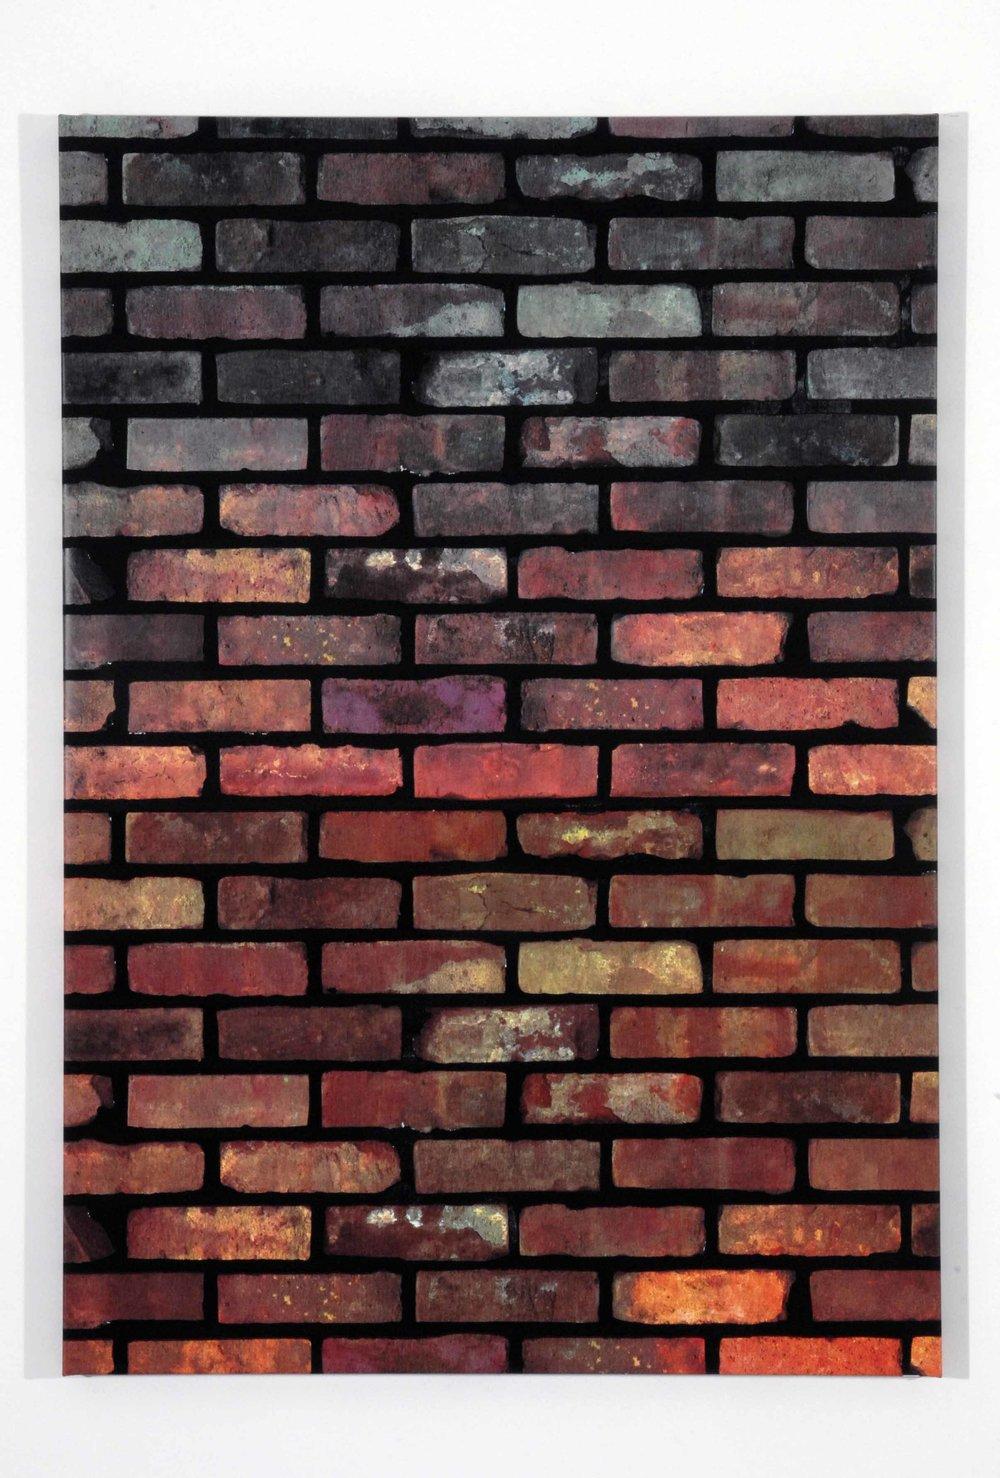 Kelley Walker,Untitled, 2006, four color process silkscreen on canvas, 136 x 95 cm (53.54 x 37.40 inch)